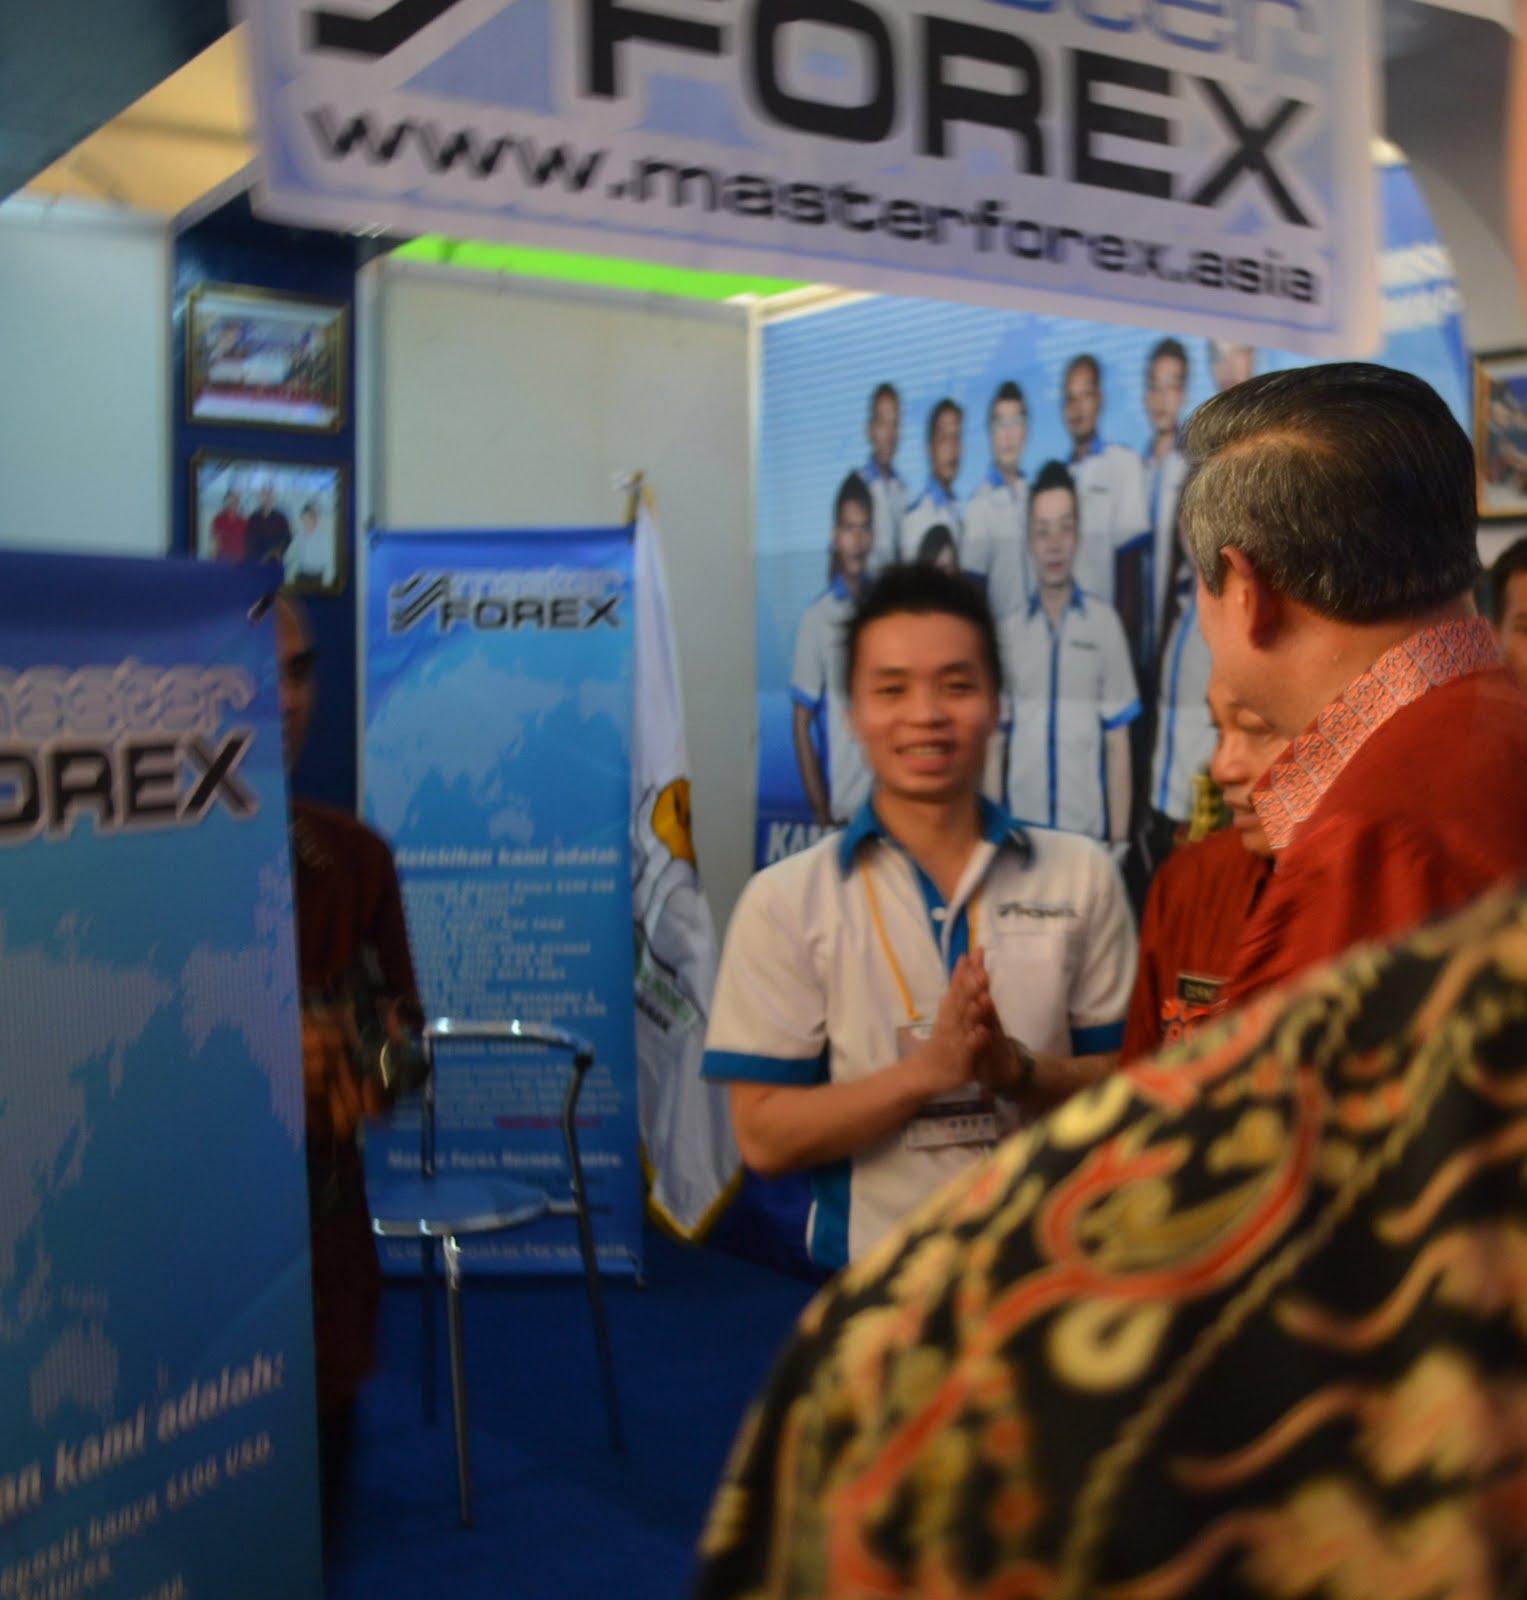 Italiana Chieti: Masterforex Borneo Ape